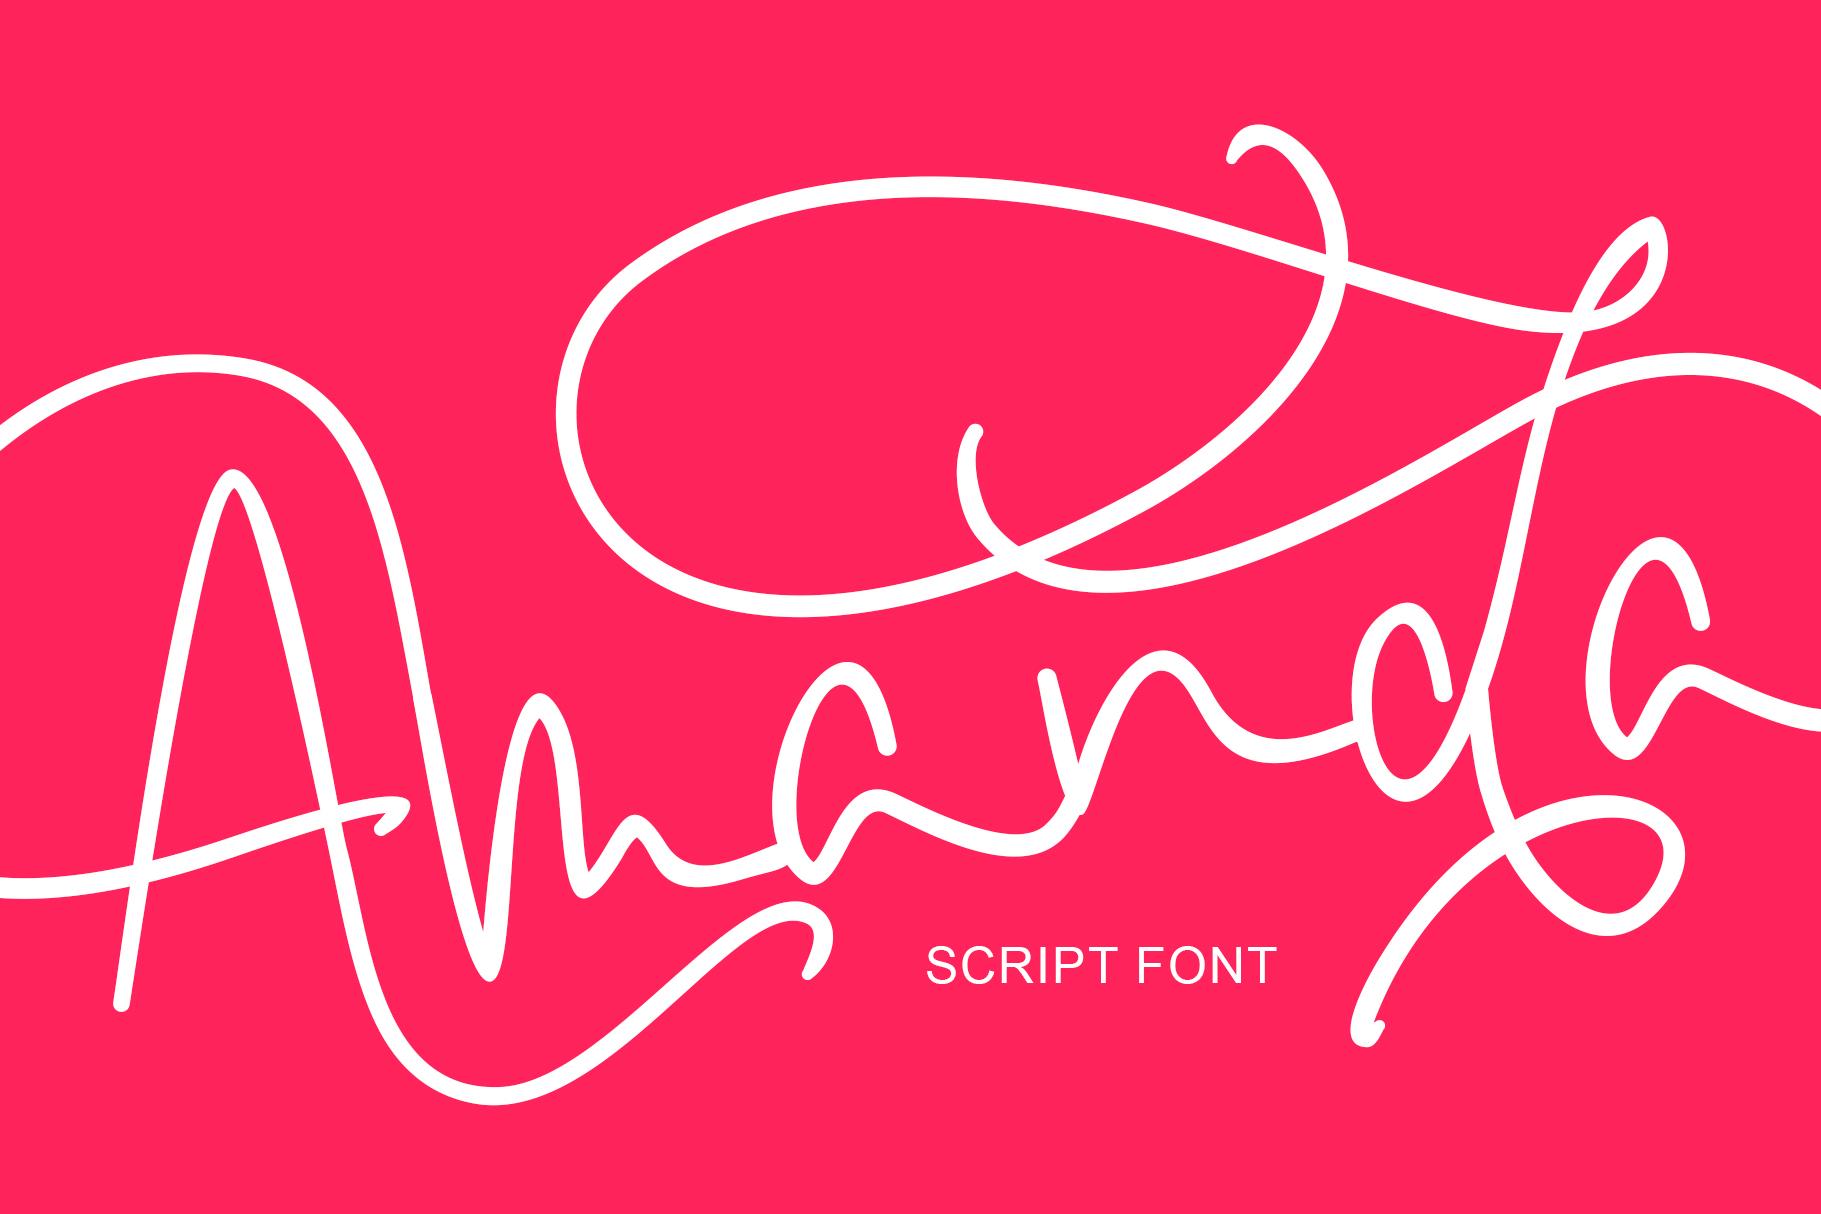 Amanda Script Font example image 2